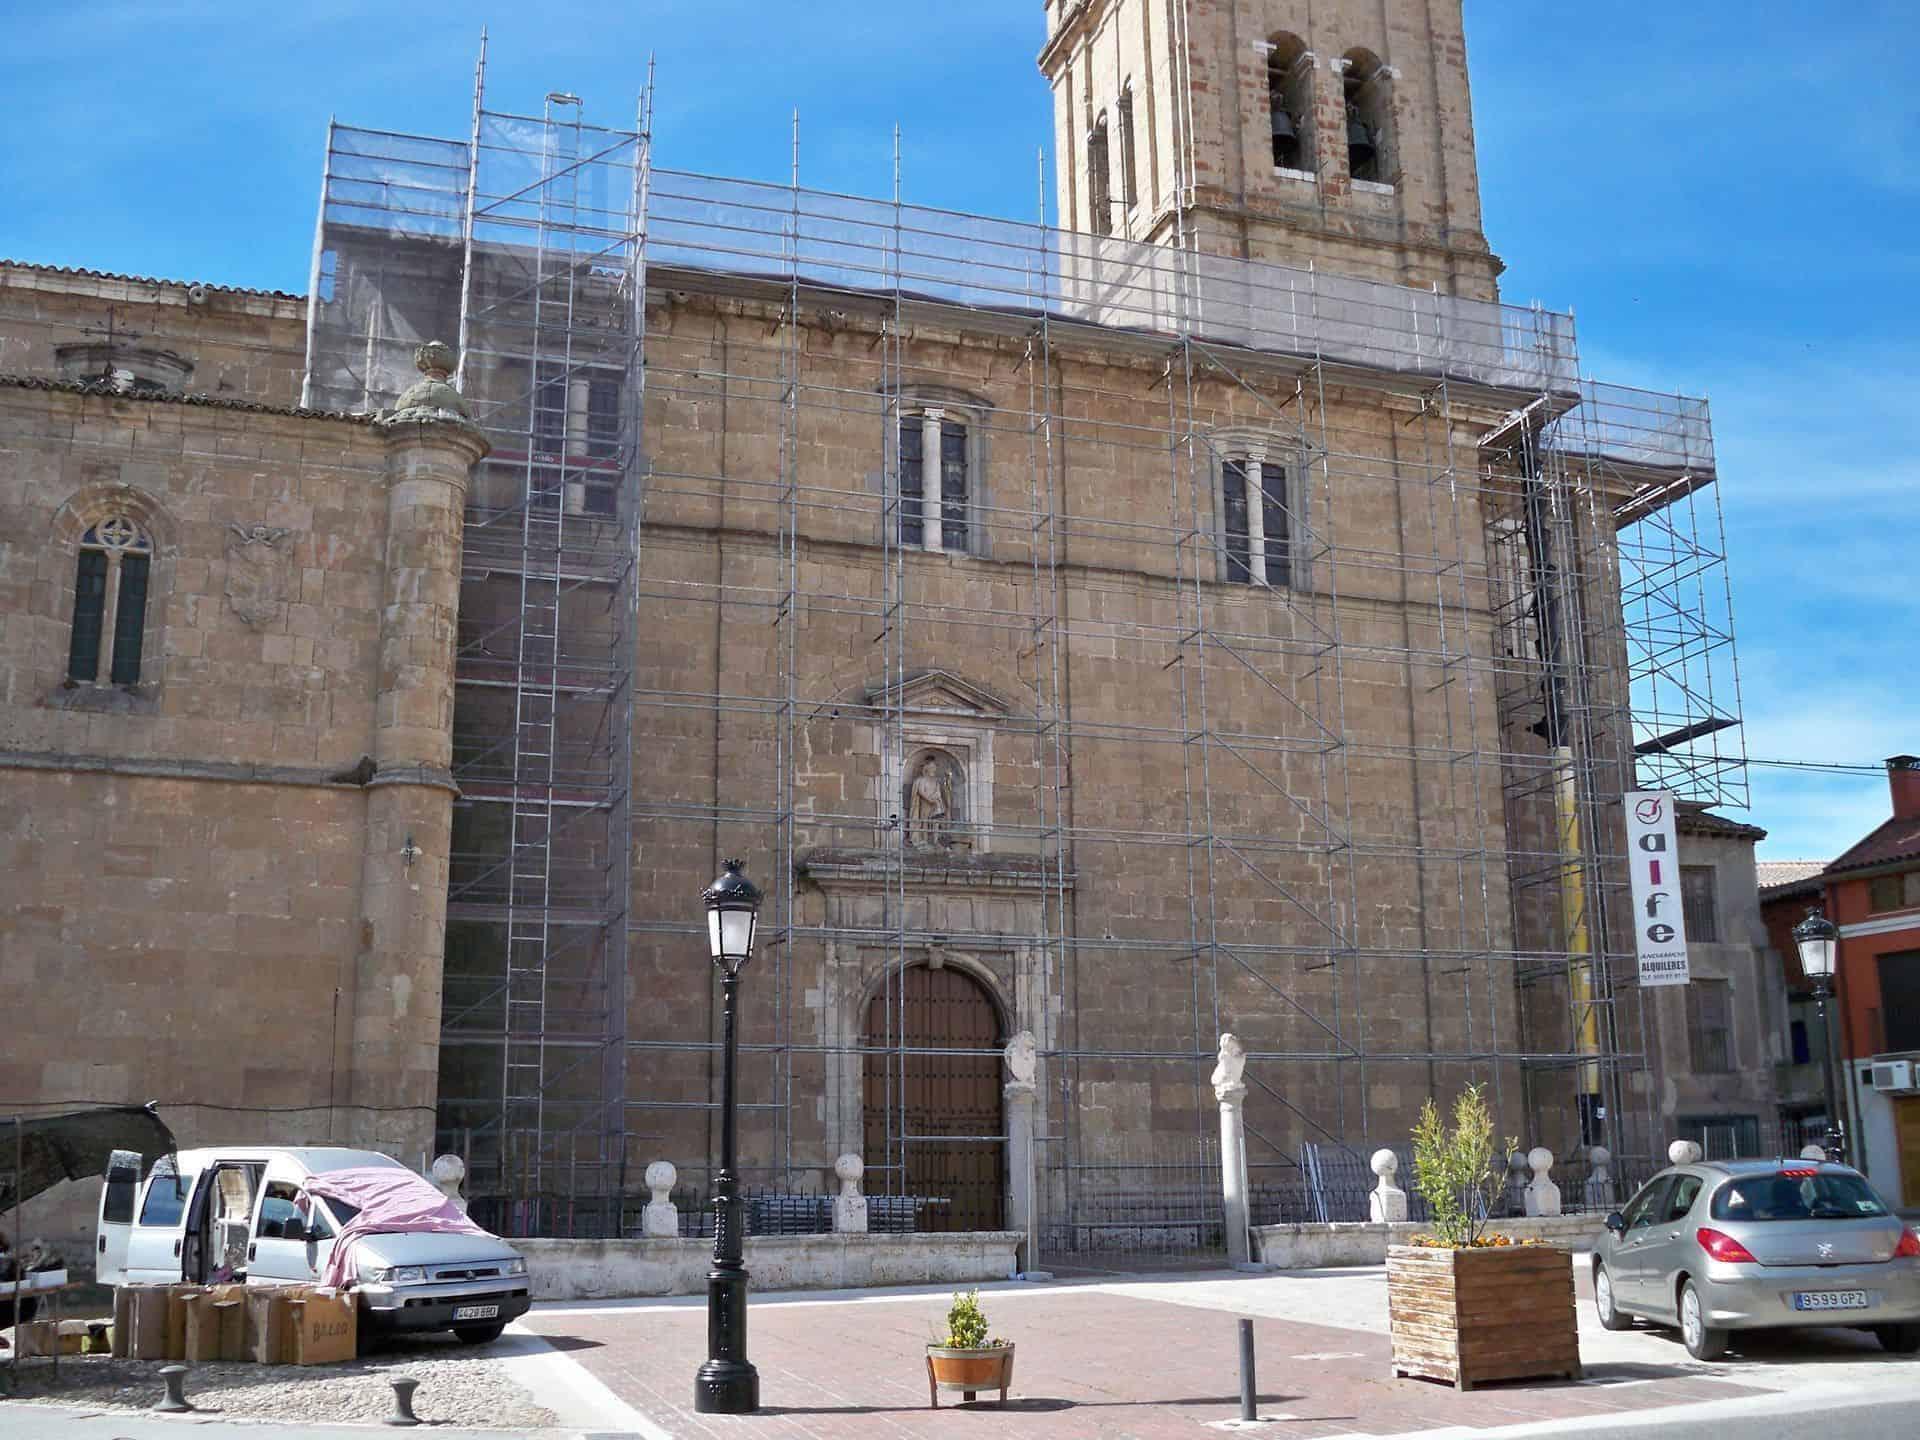 montaje-andamio-rehbilitacion-iglesia-nava-del-rey